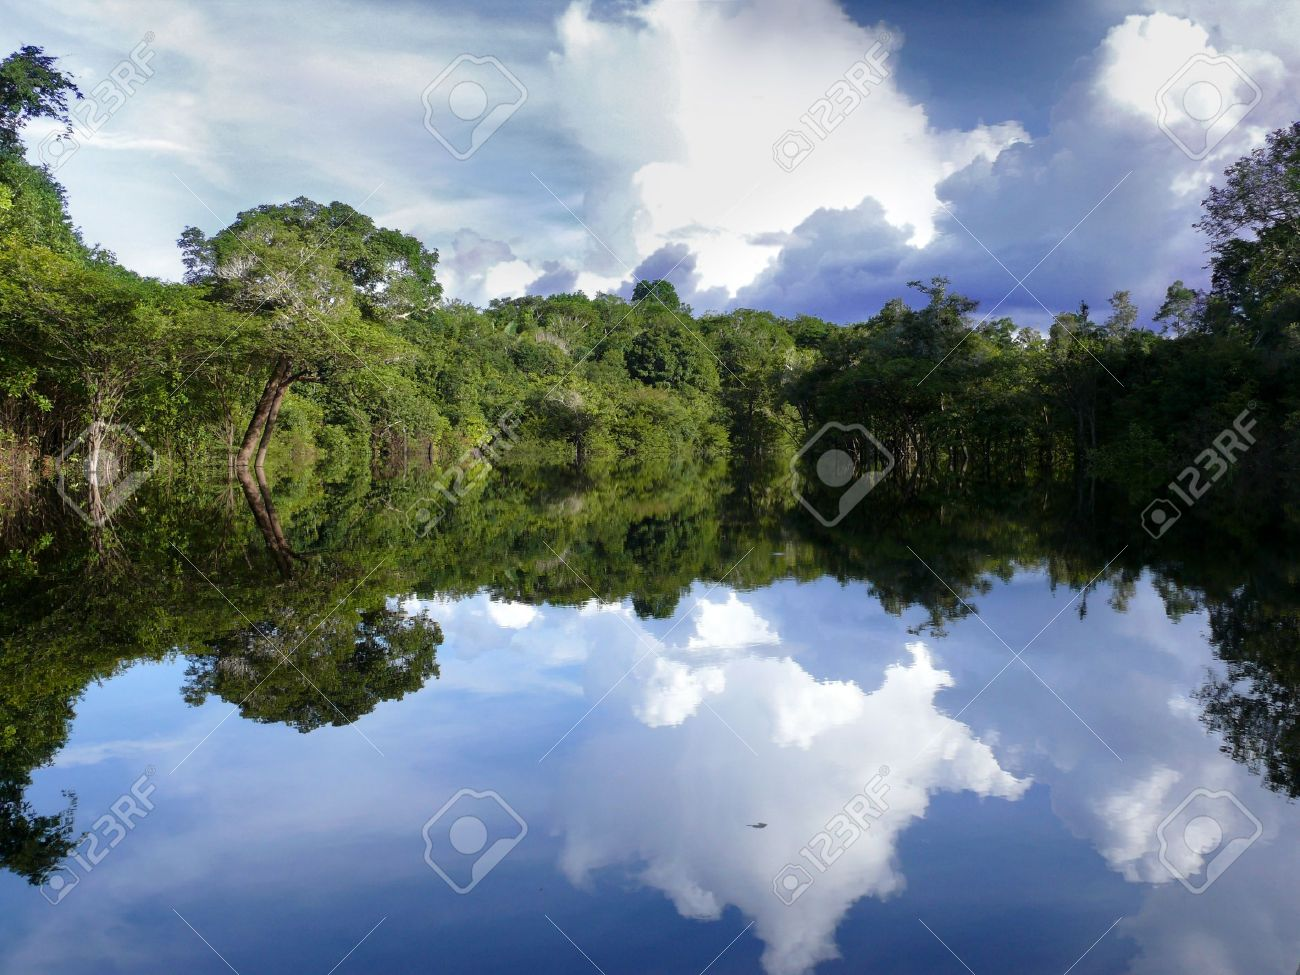 Reflections of Amazon river, Brazil Stock Photo - 9360602